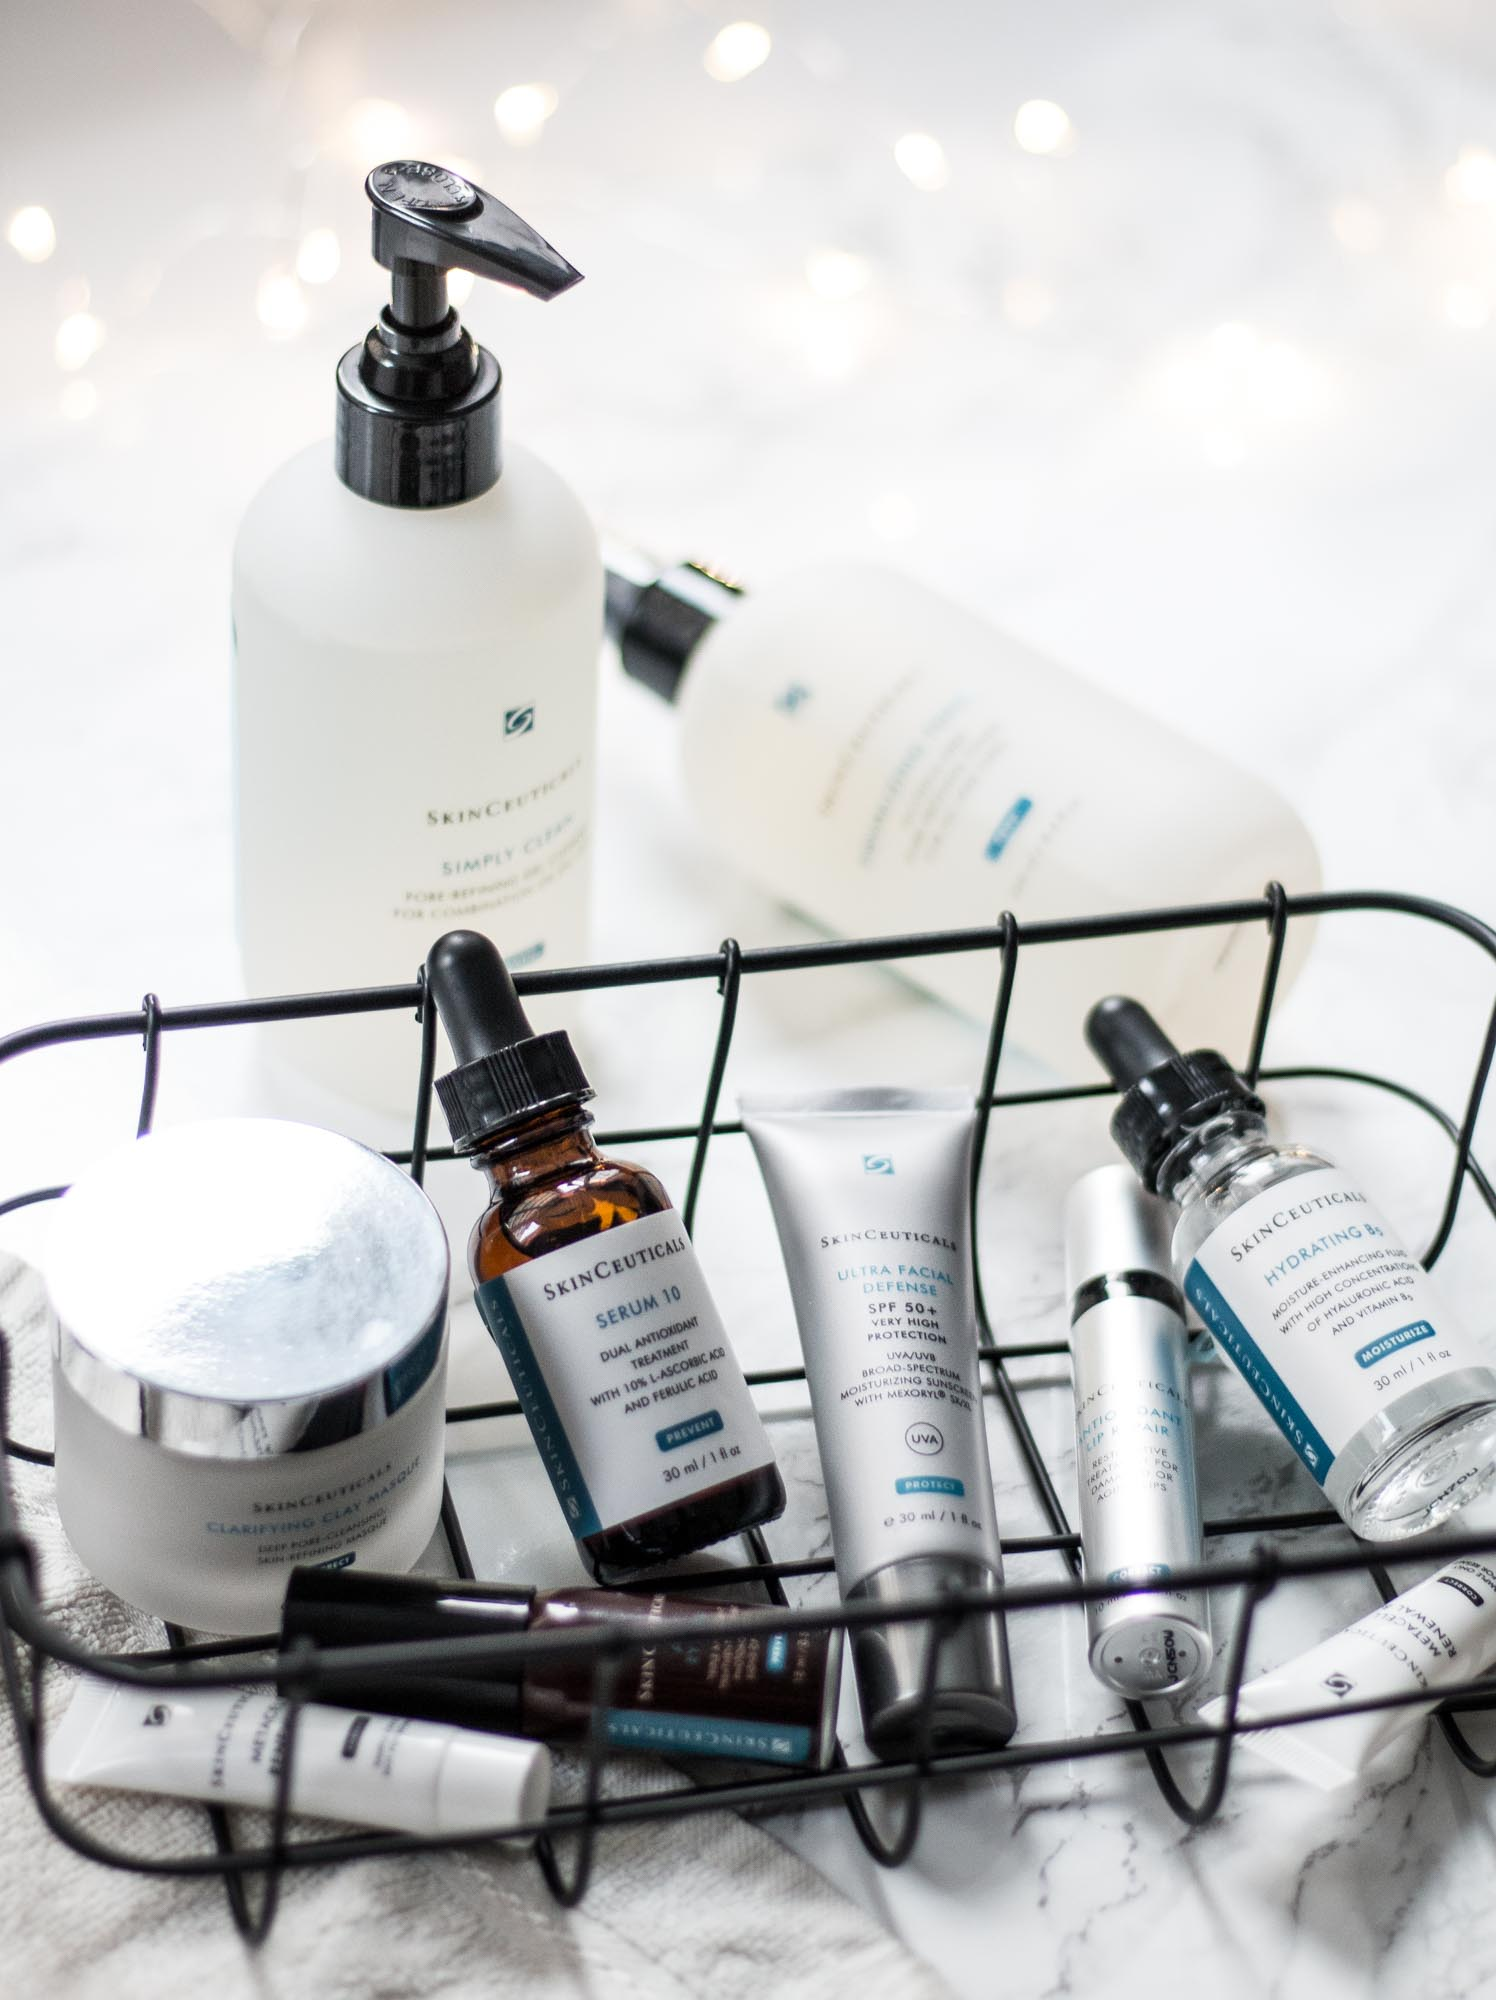 skinceuticals-produkte-beautyblogger-giveherglitter-1